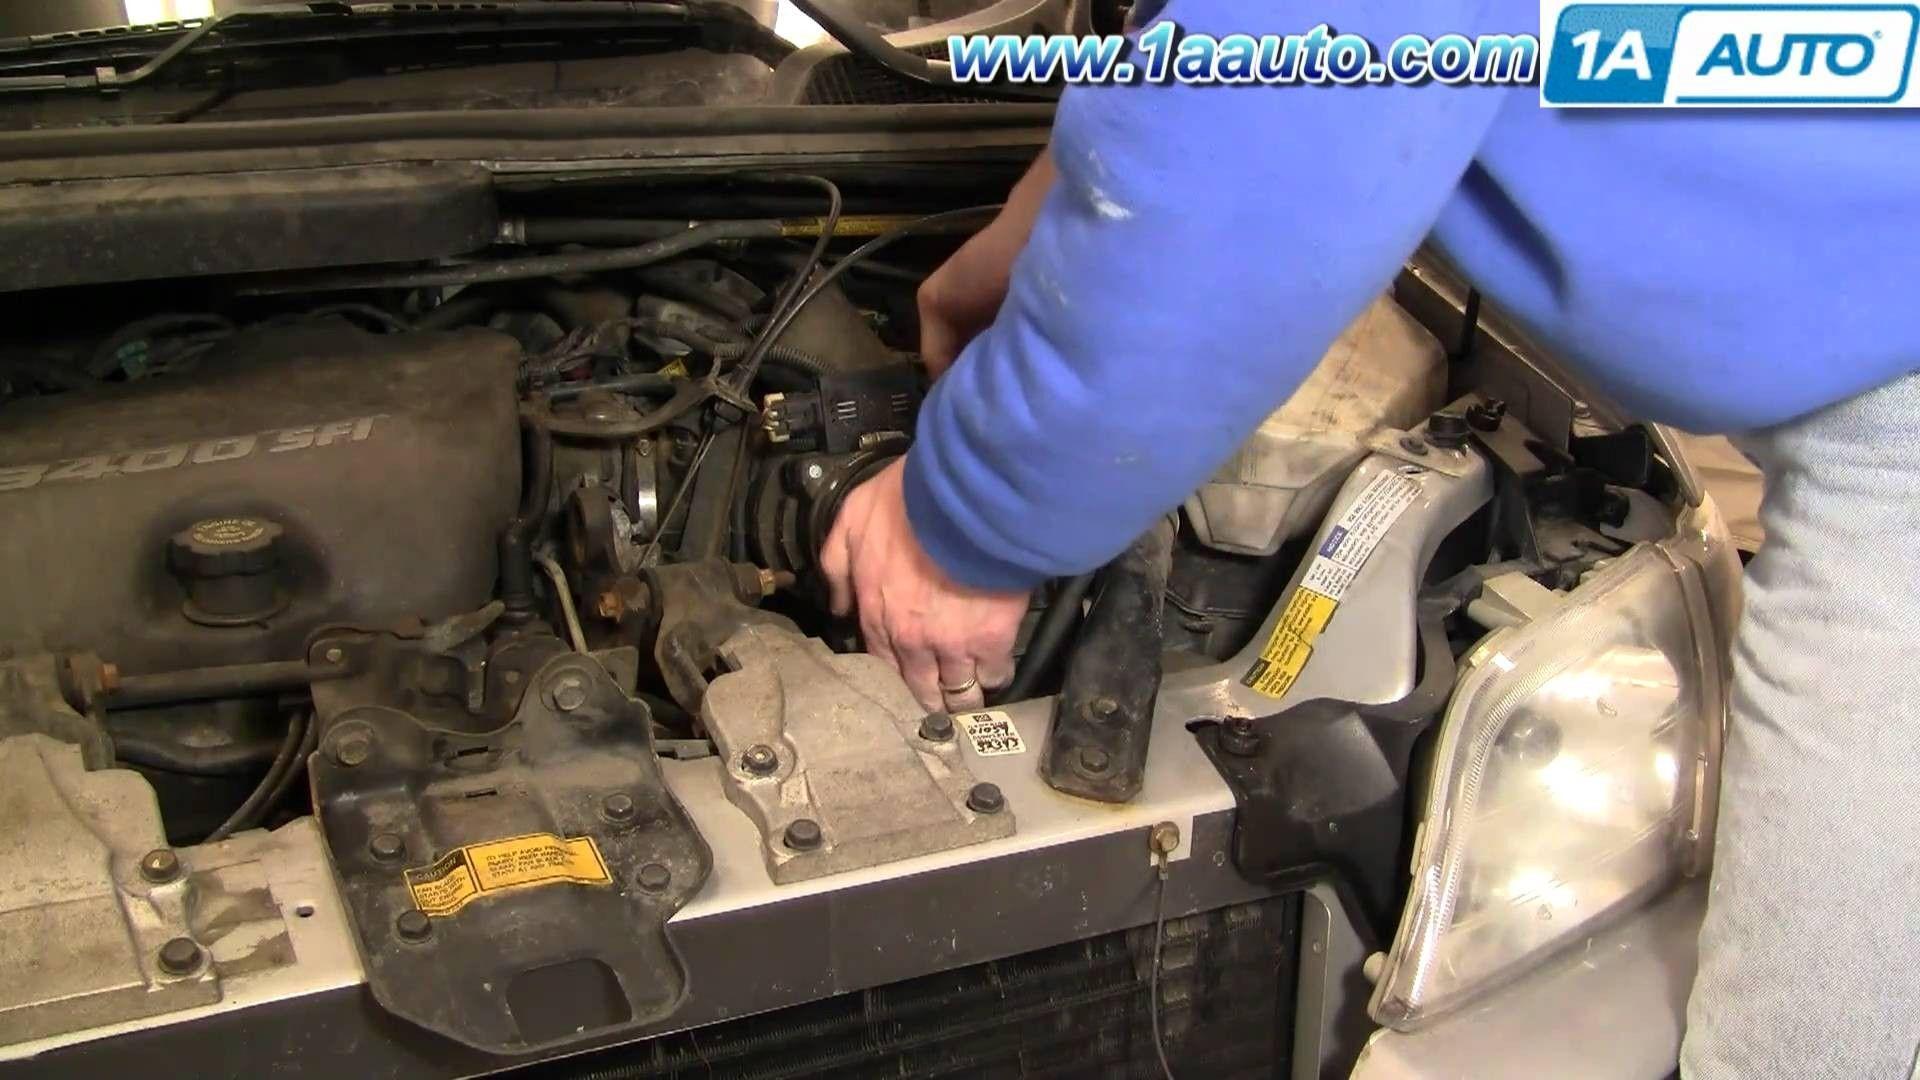 2004 Chevy Venture Engine Diagram Chevy Pontiac Montana Engineering